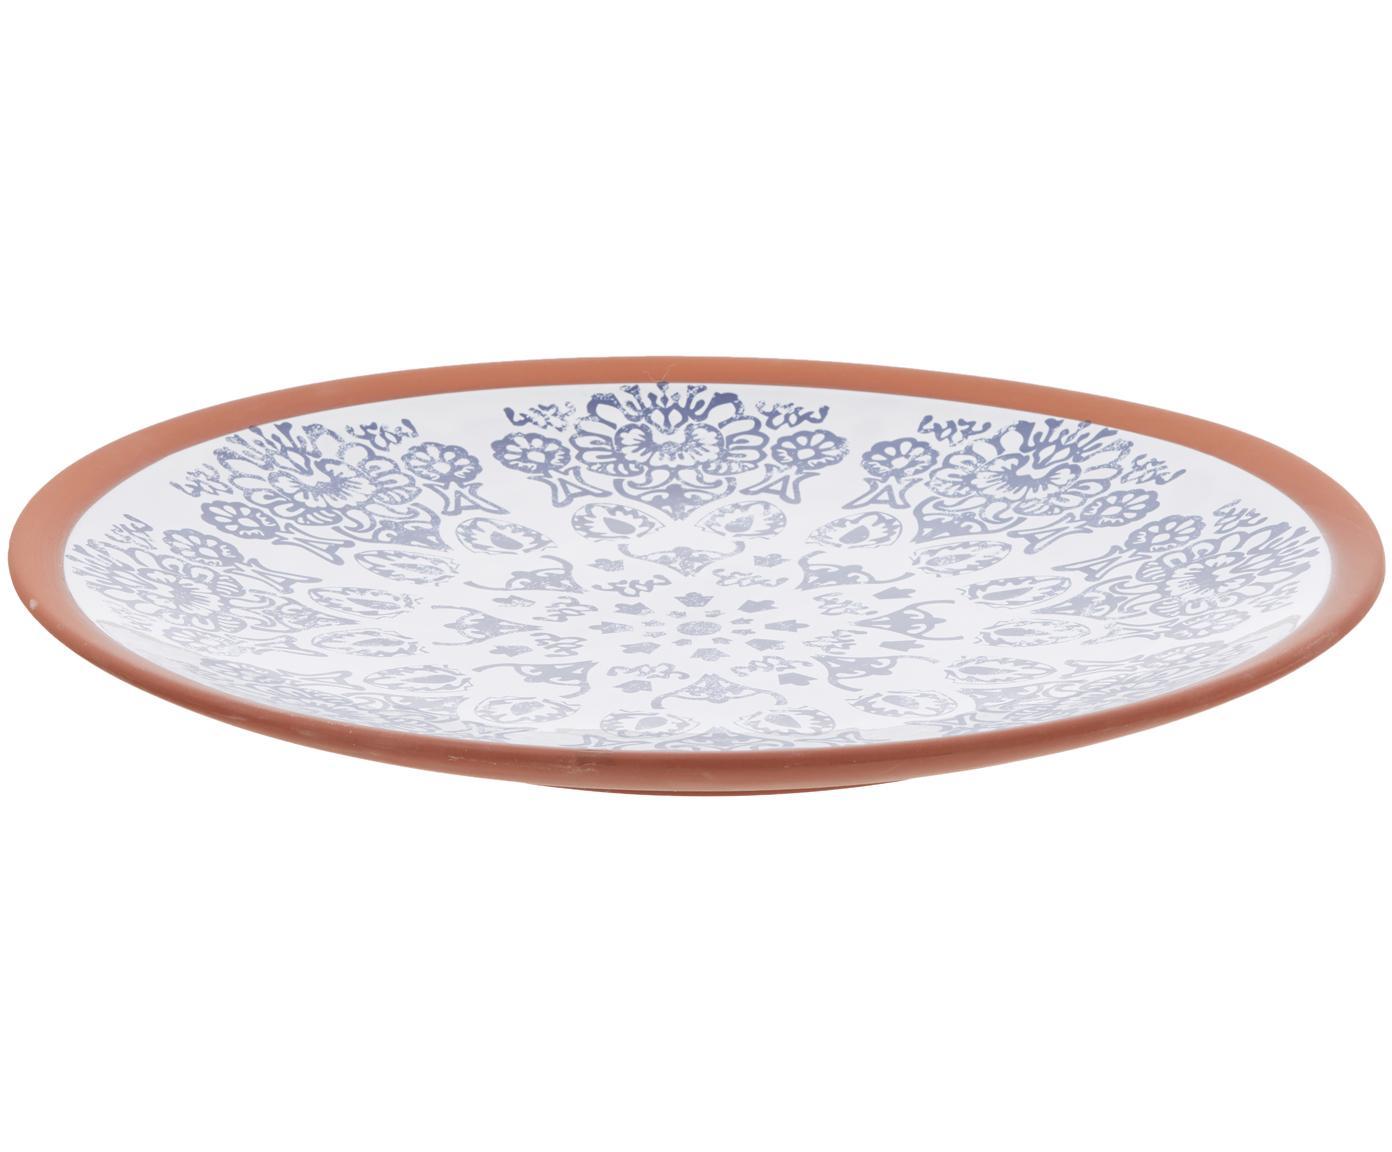 Handgemaakt serveerplateau Tapas, Terracotta, Blauw, wit, bruin, Ø 37 x H 6 cm